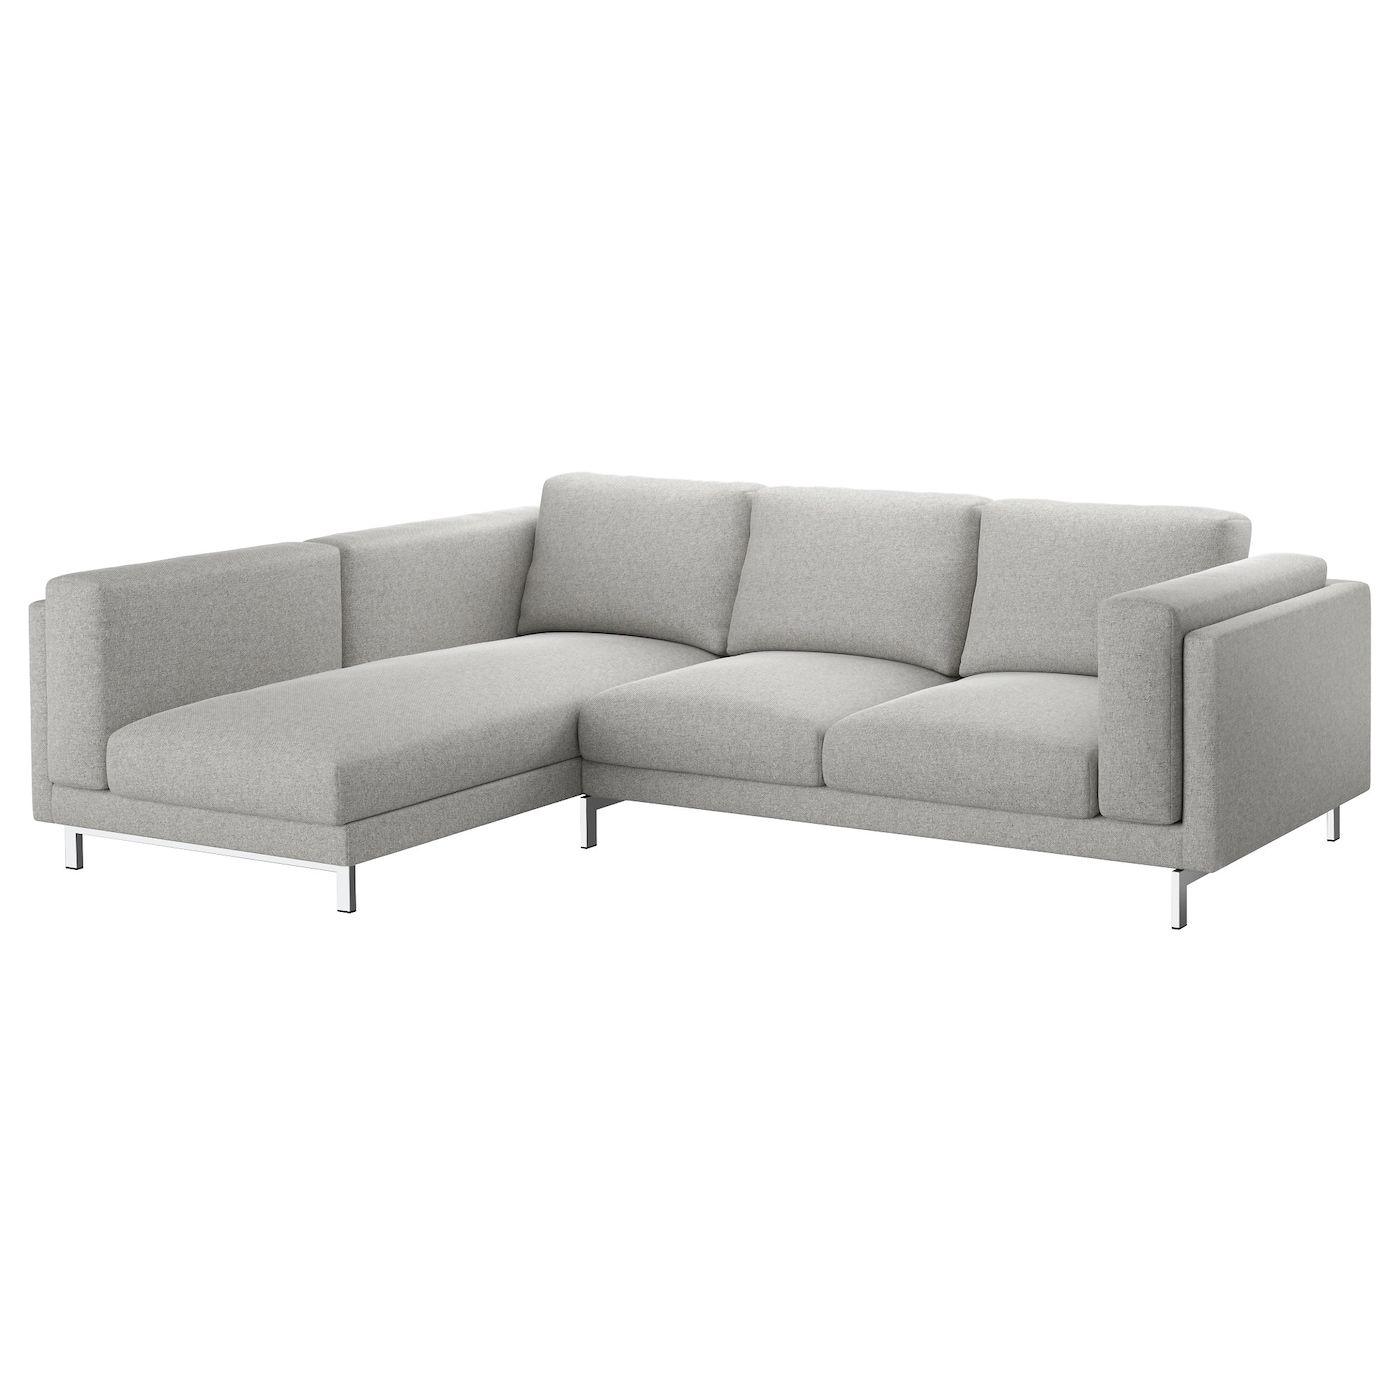 Nockeby 3er Sofa Tallmyra Mit Recamiere Links Tallmyra Verchromt Weiss Schwarz Verchromt Ikea Deutschland 3er Sofa Chaiselongue 2er Sofa